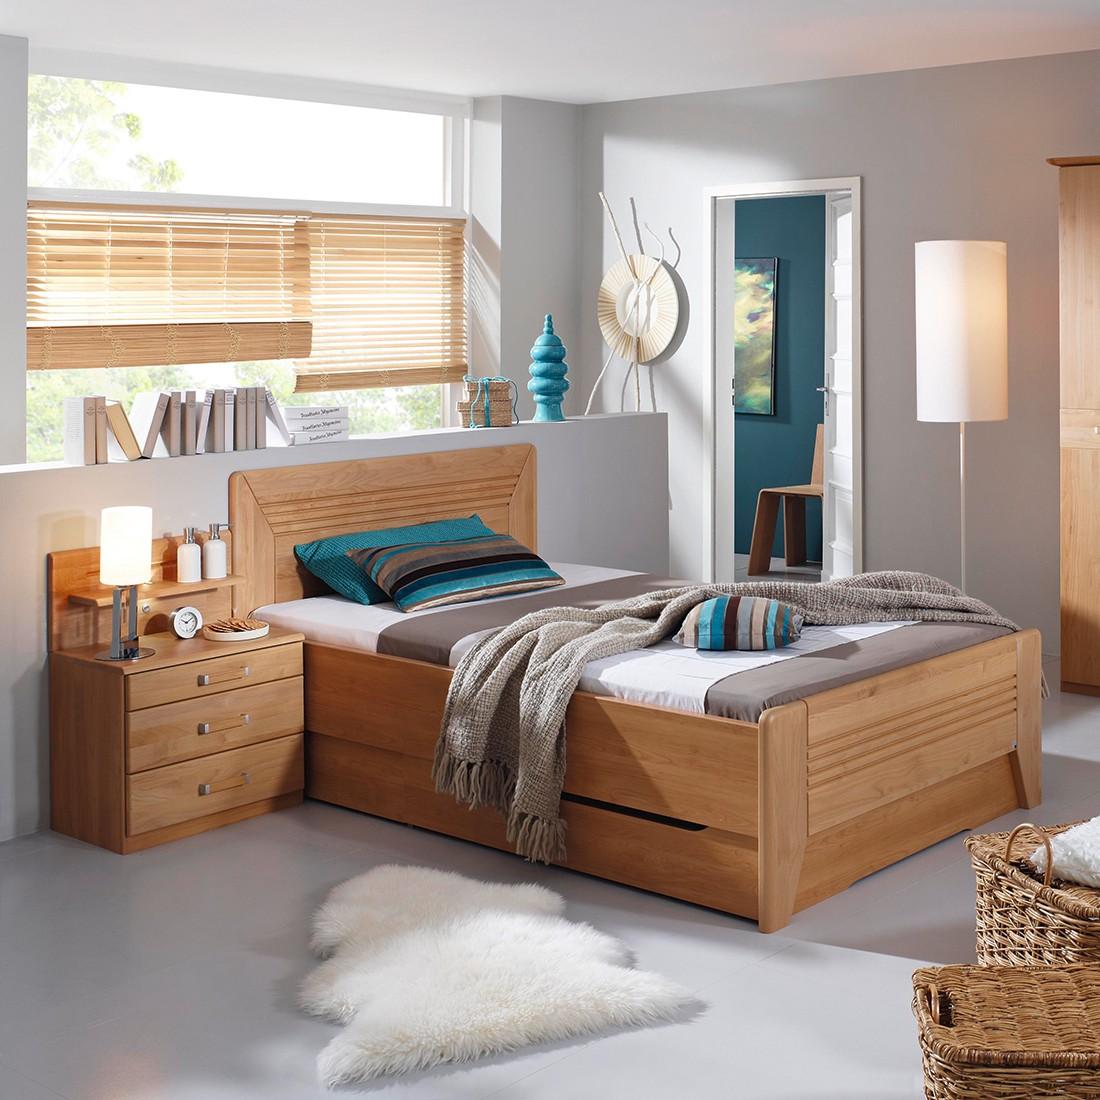 Home24 Deels massief bed Valerie III, Rauch Steffen